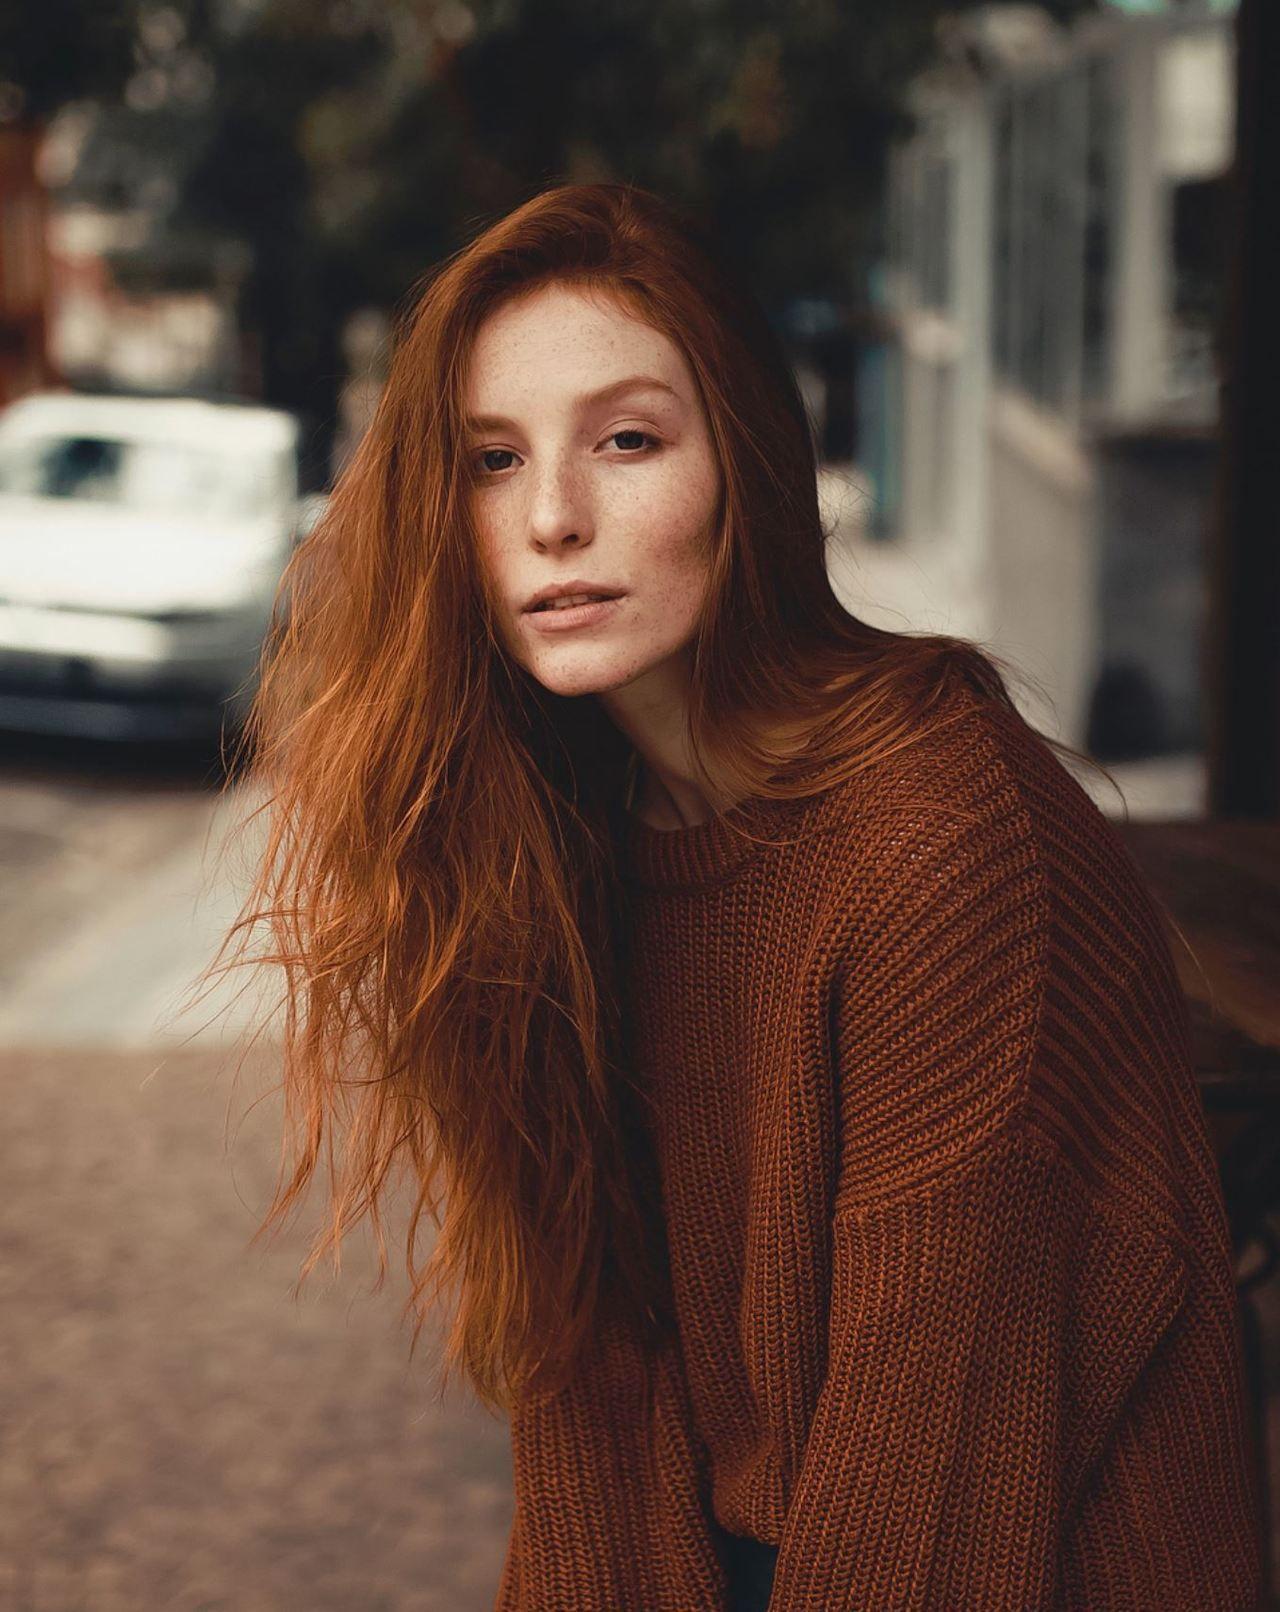 wahre redhead porno